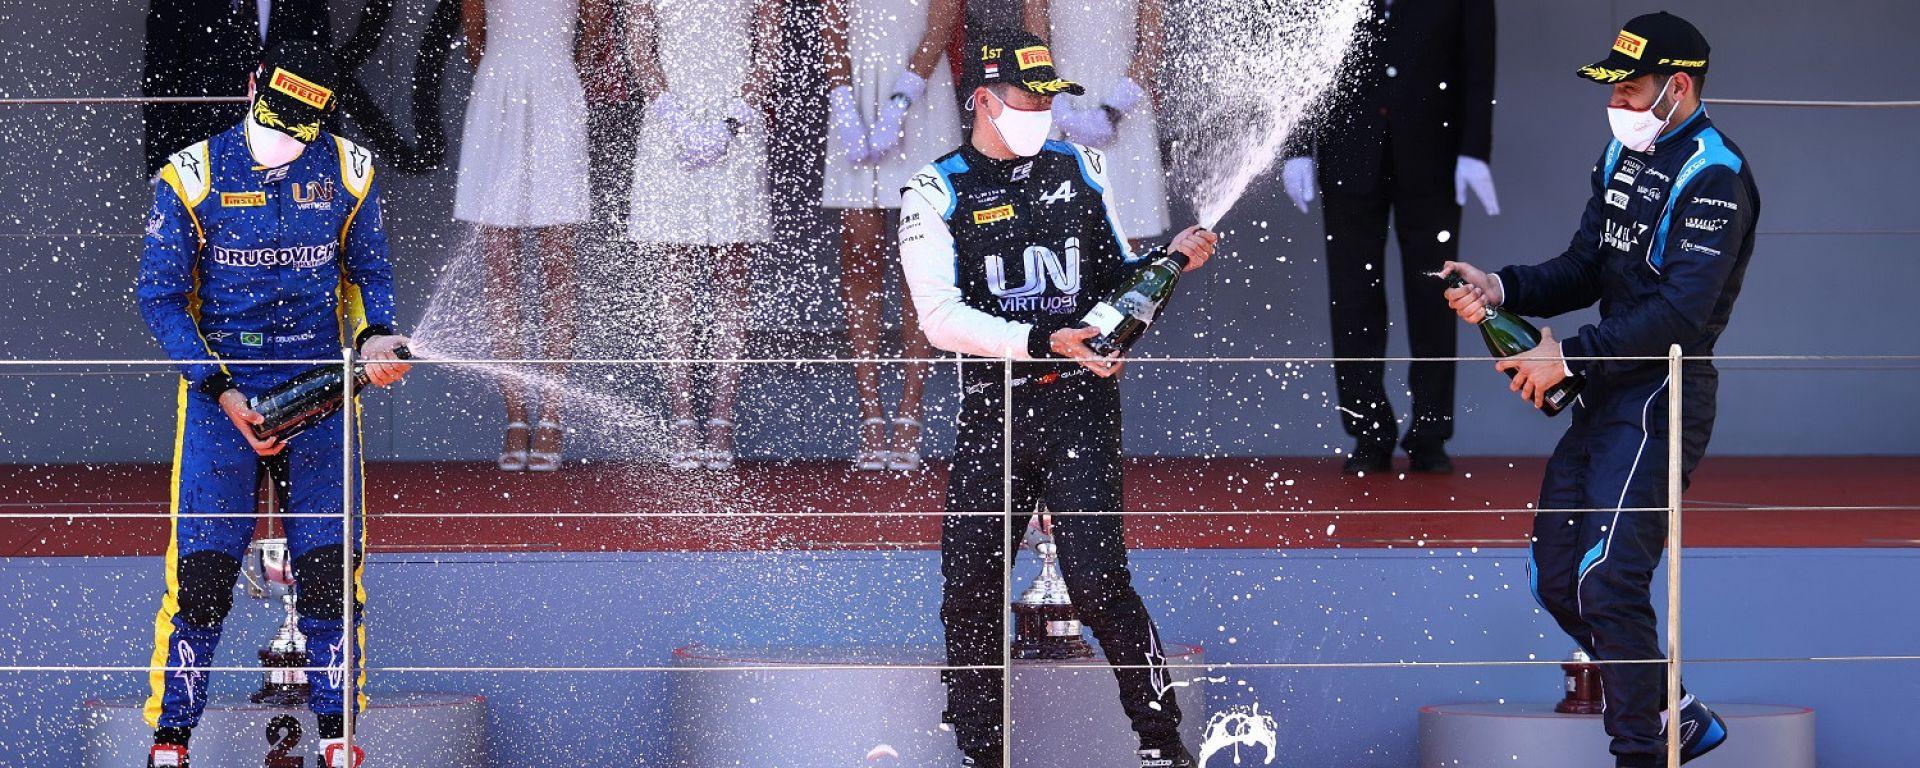 F2 GP Monaco 2021, Monte Carlo: Guanyu Zhou, Felipe Drugovich (Uni-Virtuosi) e Roy Nissany (DAMS)